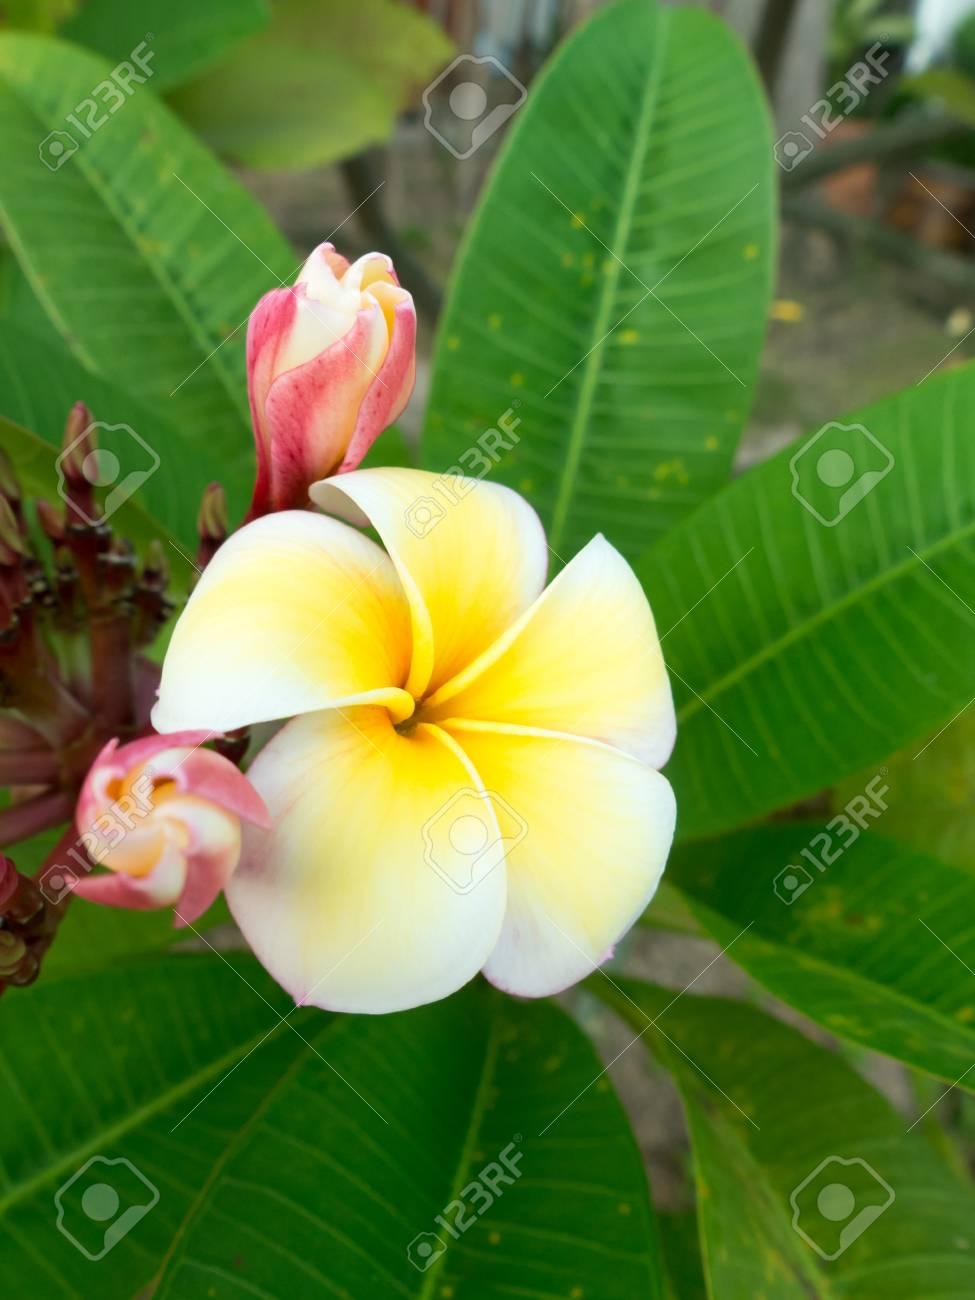 Beautiful White And Yellow Plumeria Flower Frangipani Flowers